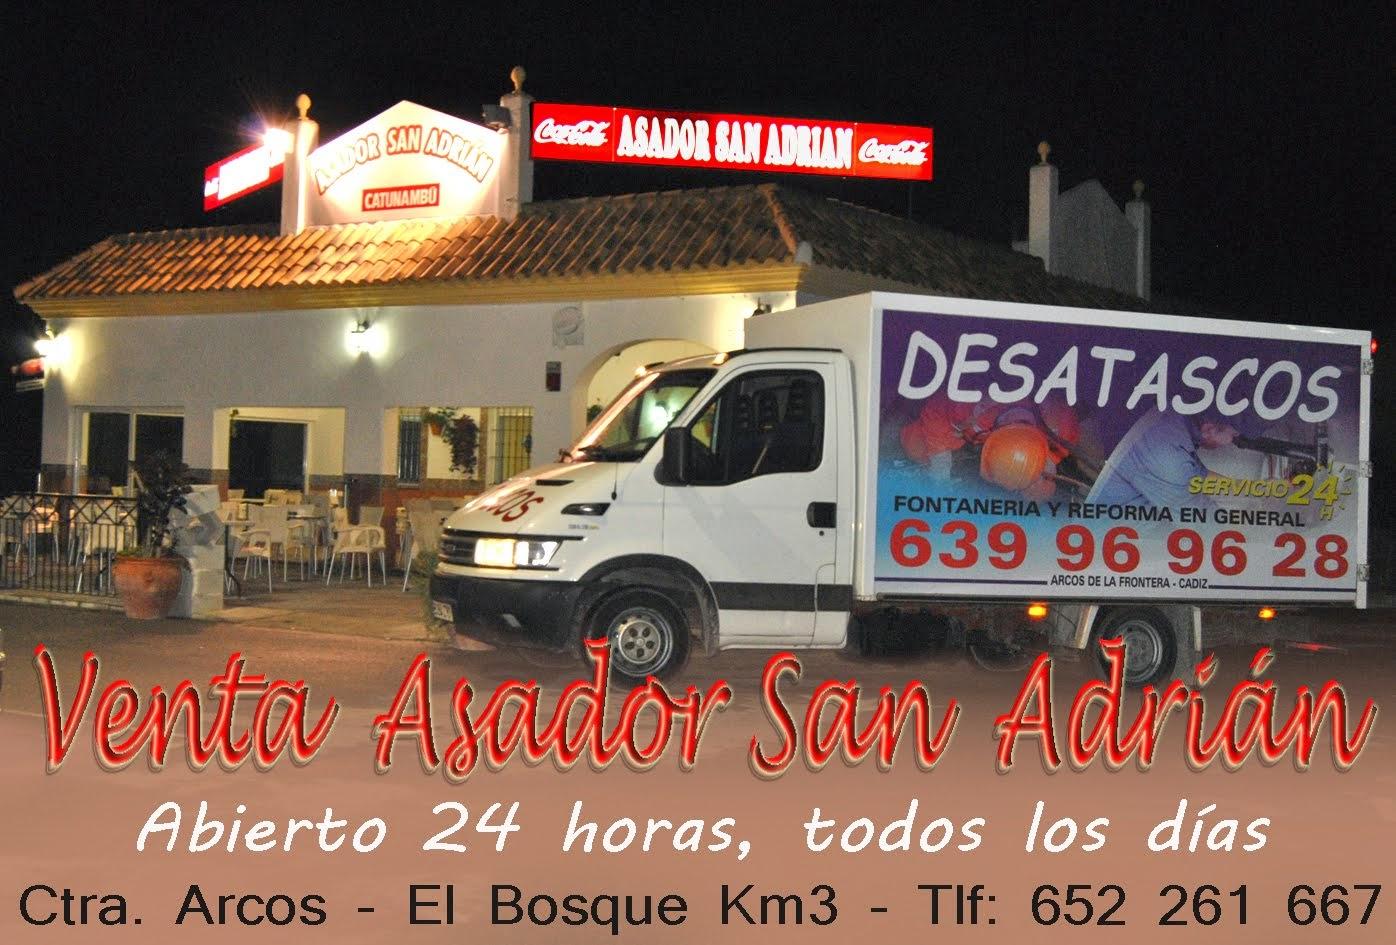 San Adrian